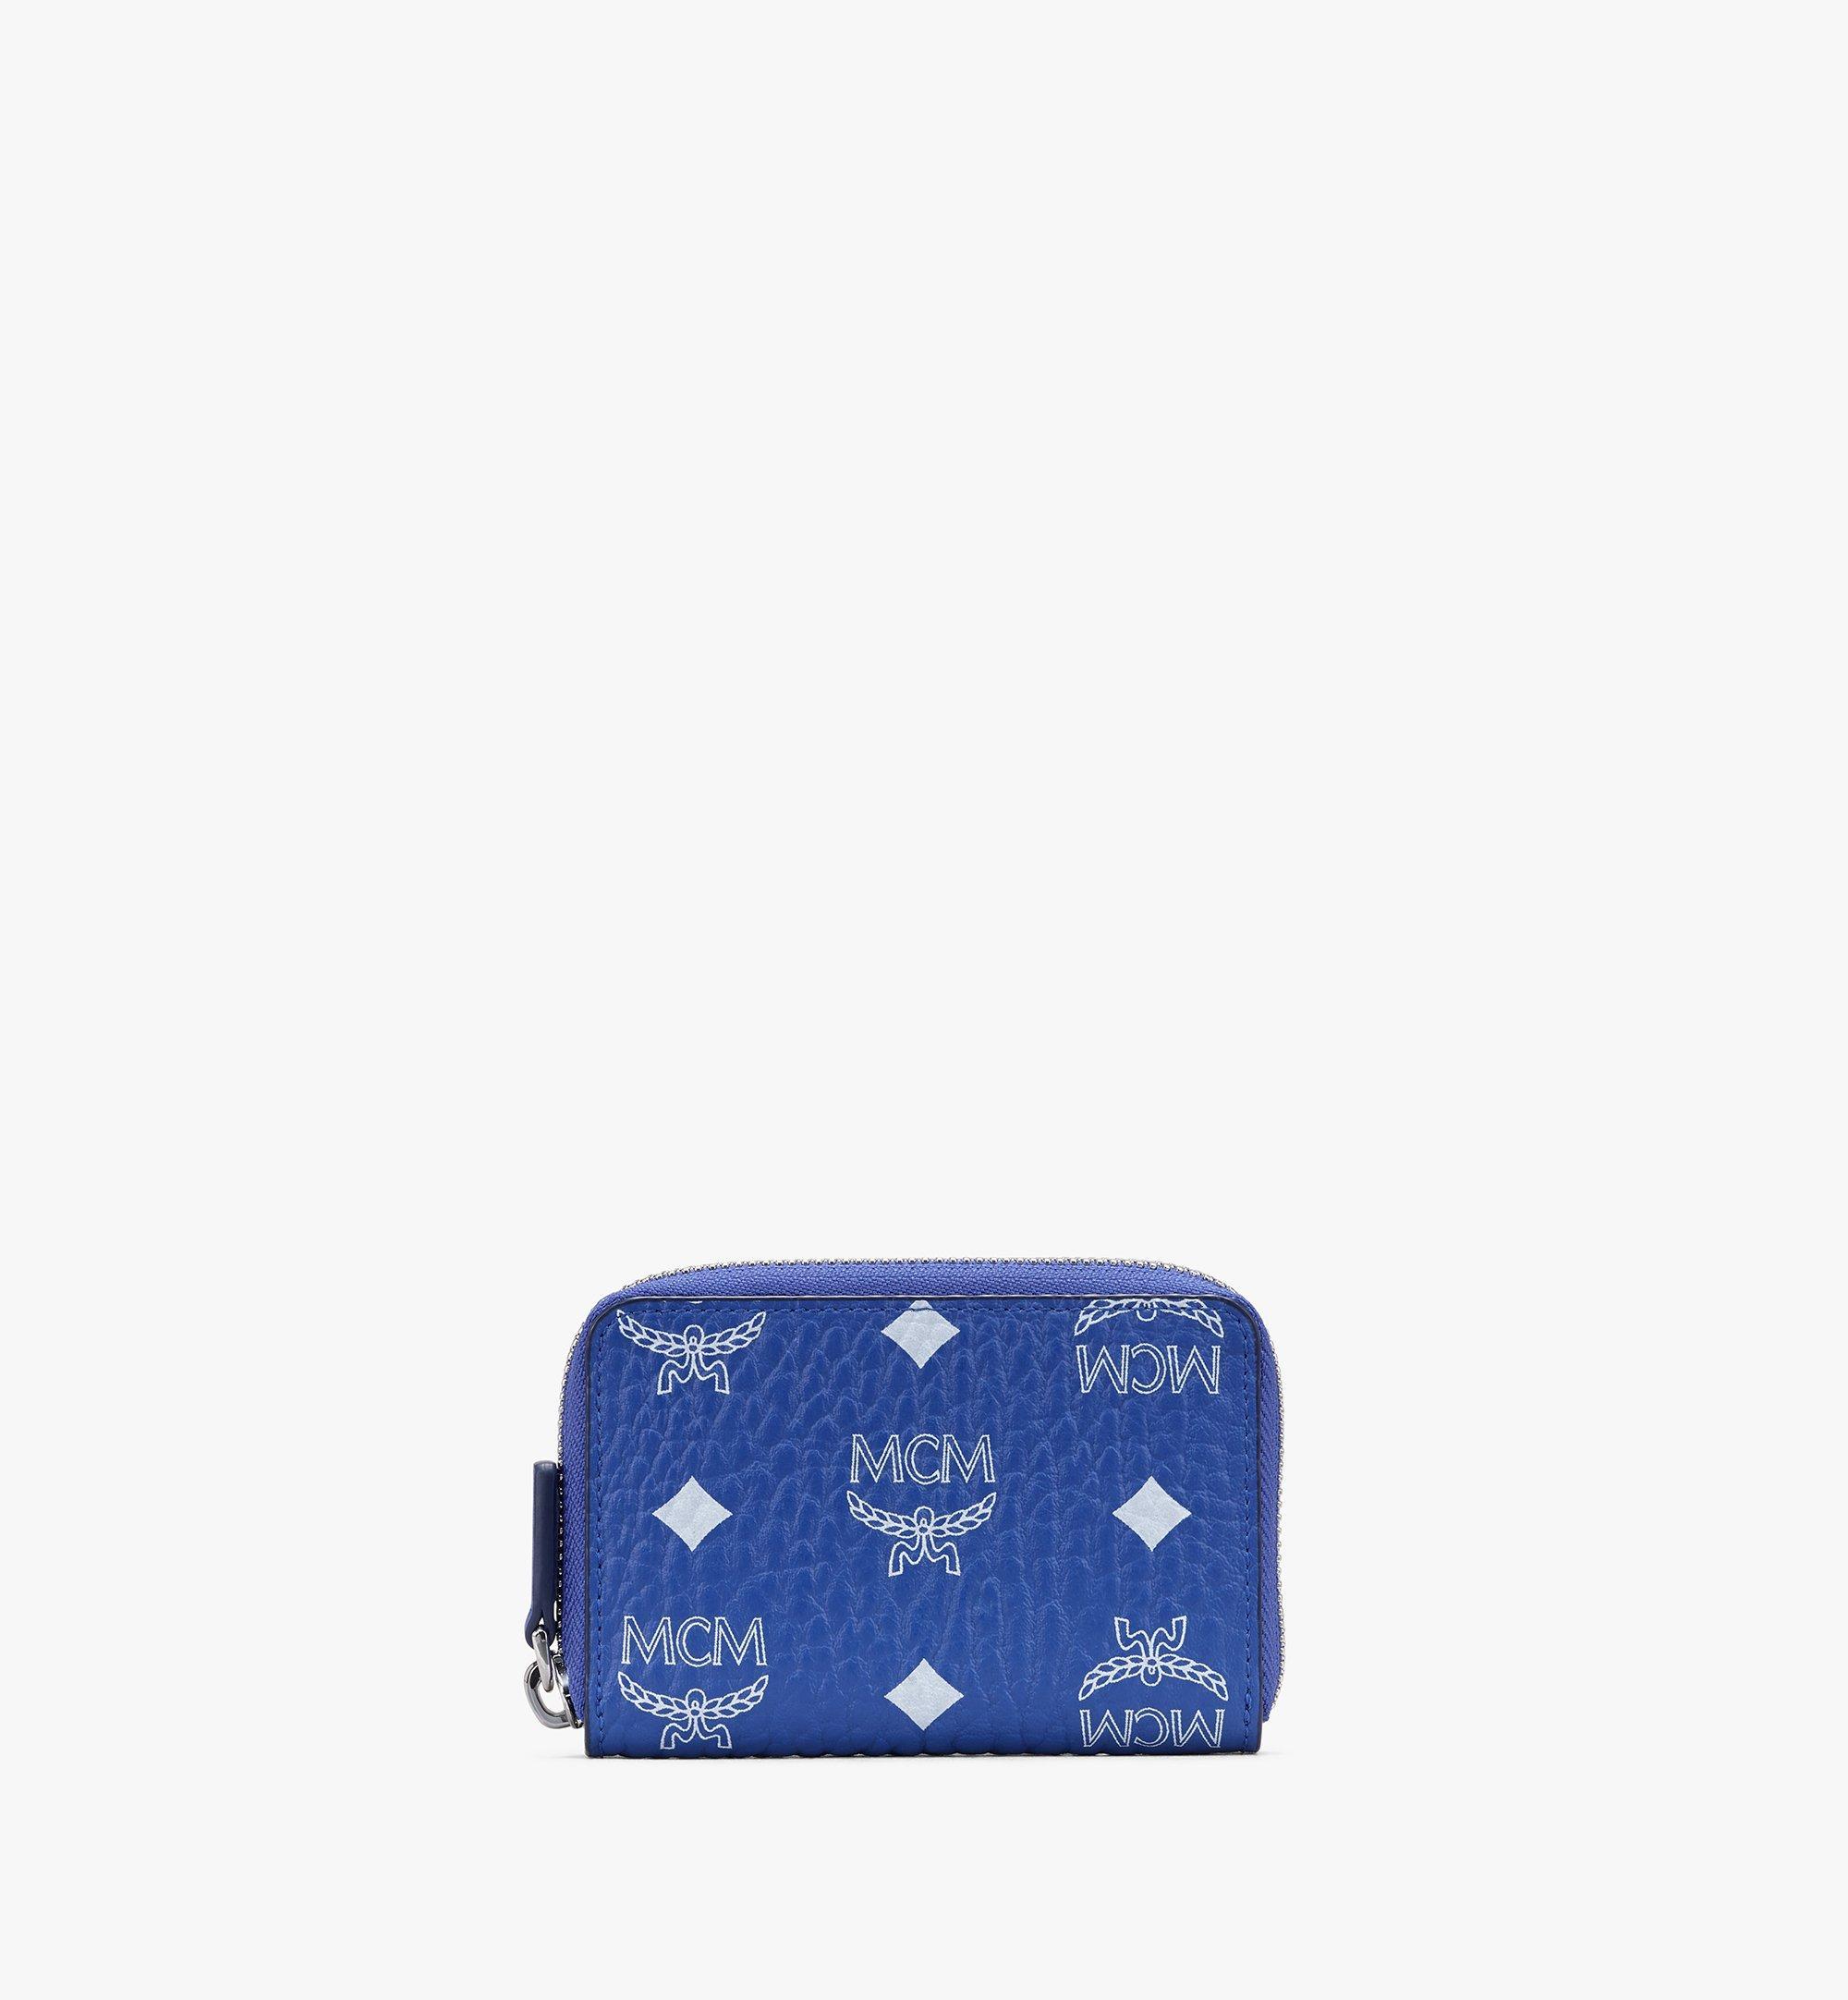 MCM Visetos 系列的全拉鏈式卡夾零錢包 Blue MXLASVI01H1001 更多視圖 1